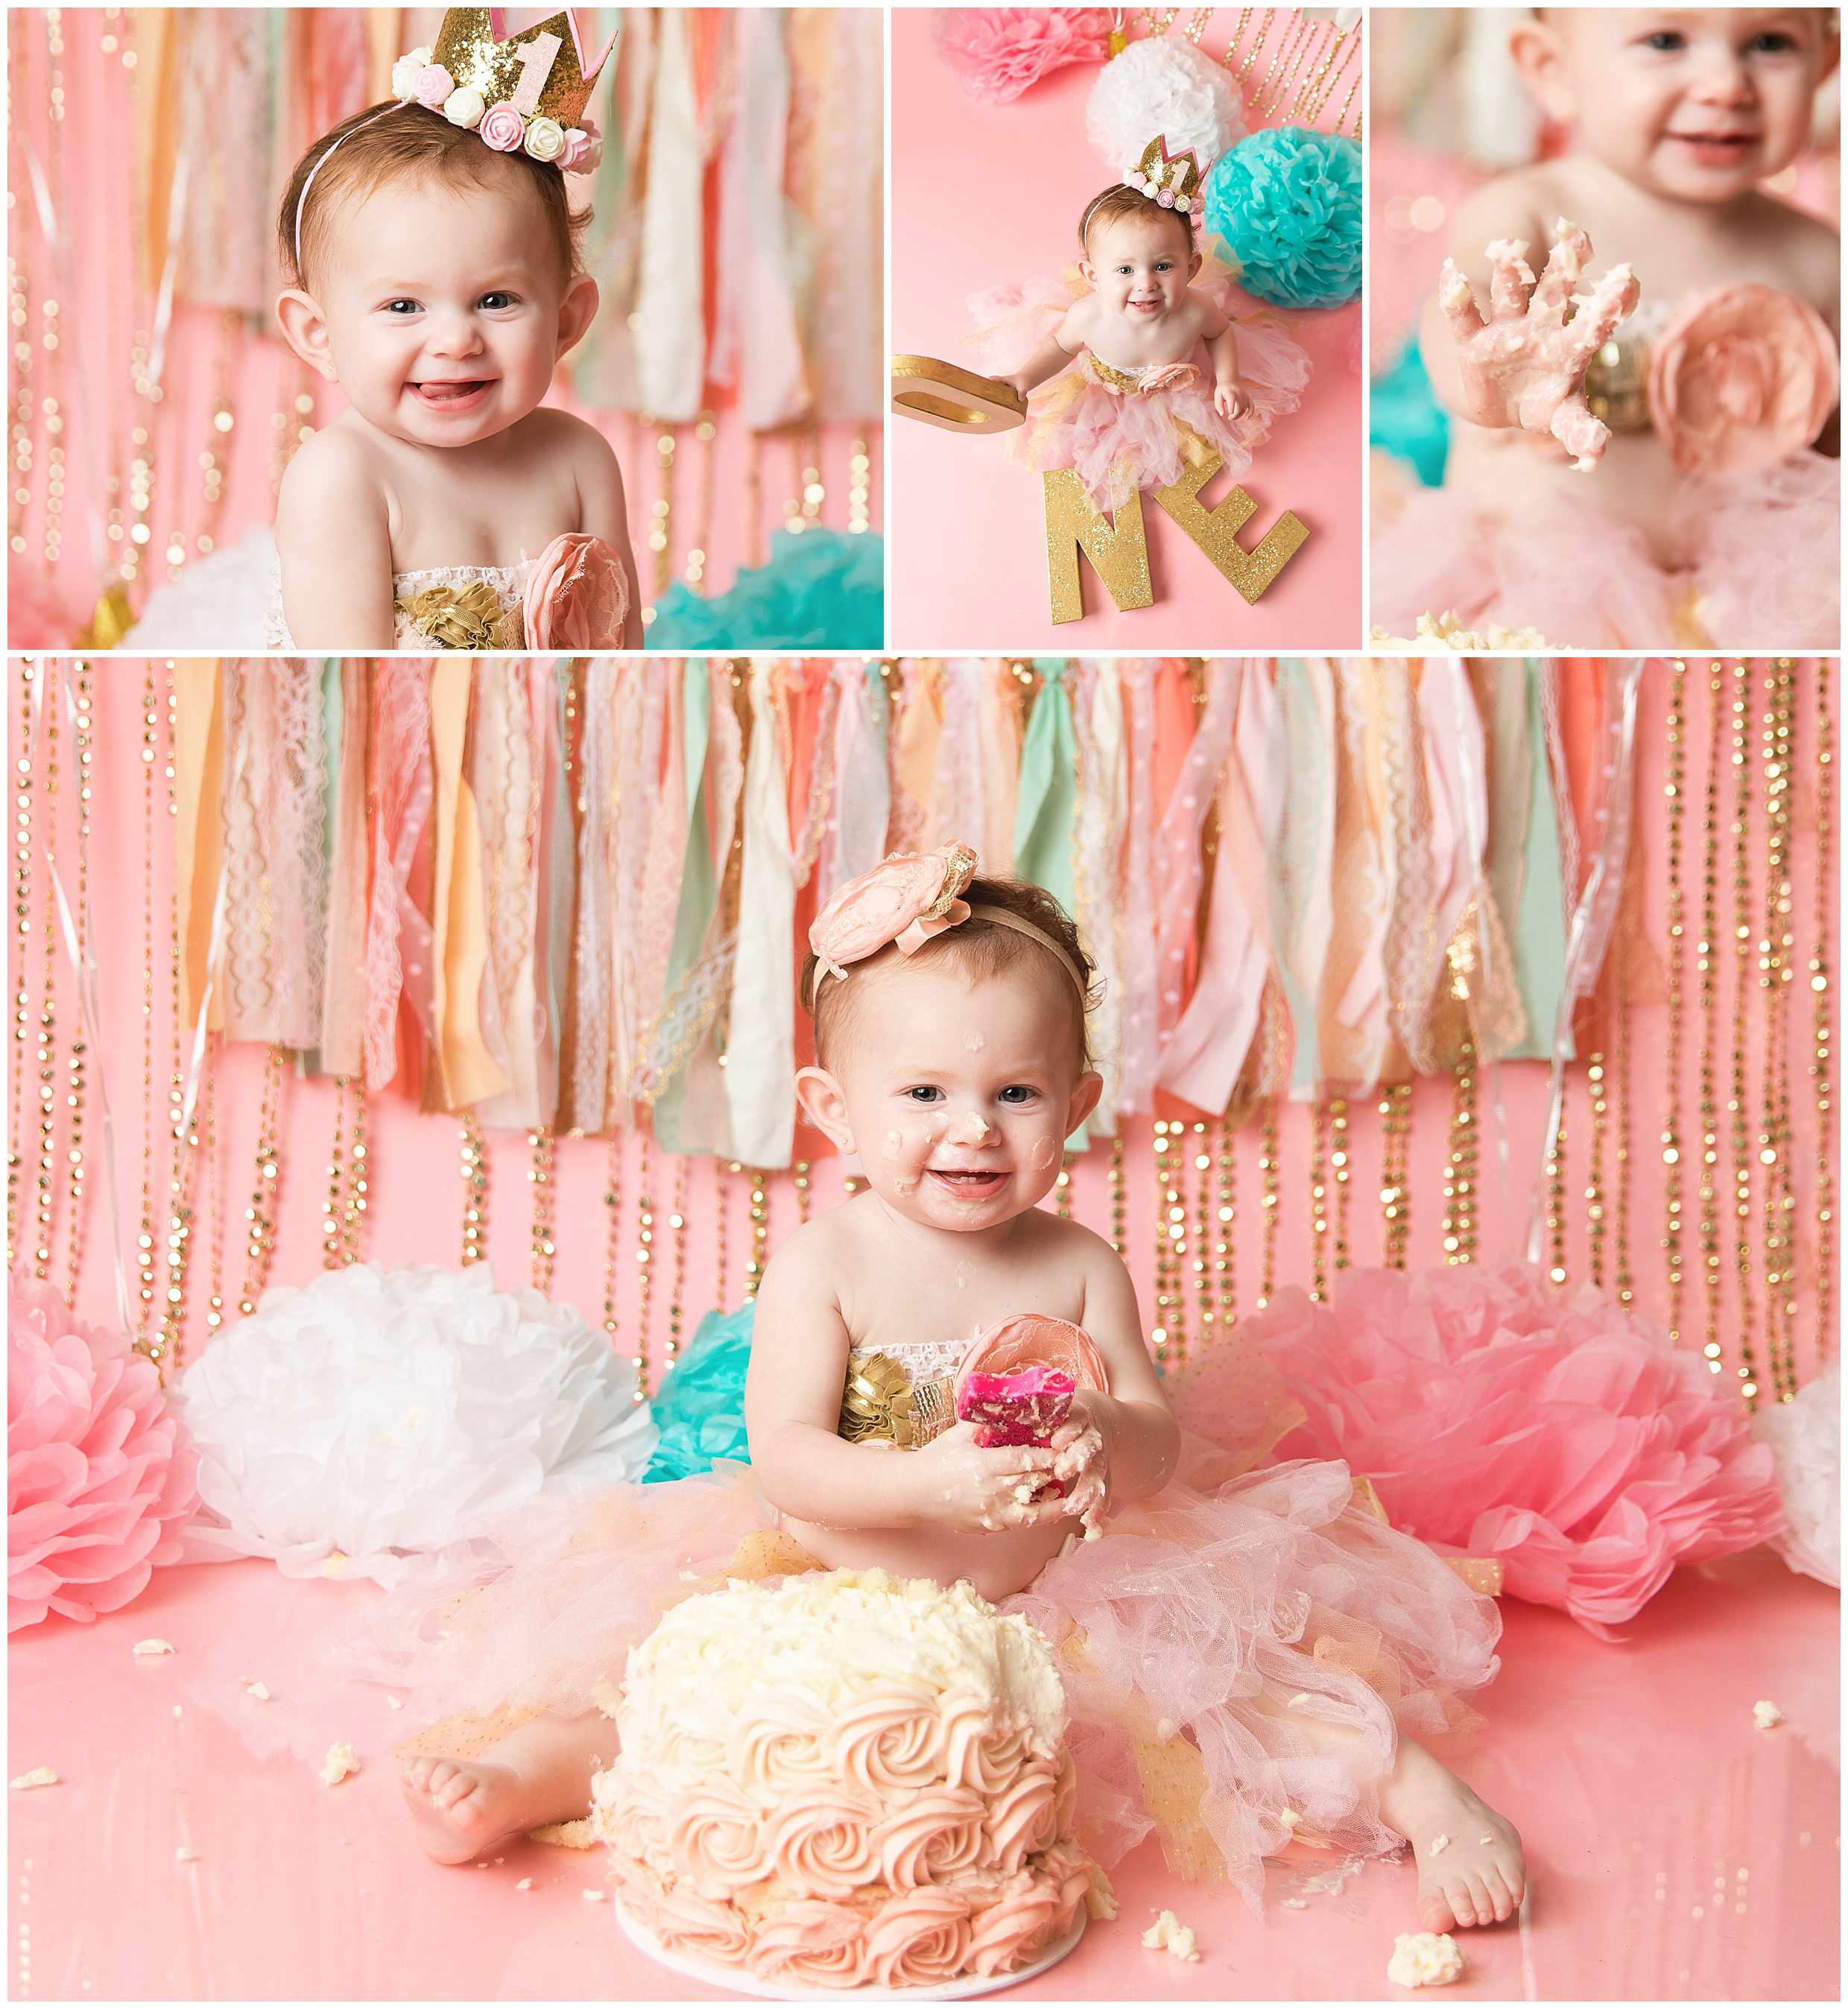 cakesmash+photography+Luciana+Golcman+NYC+78.jpg